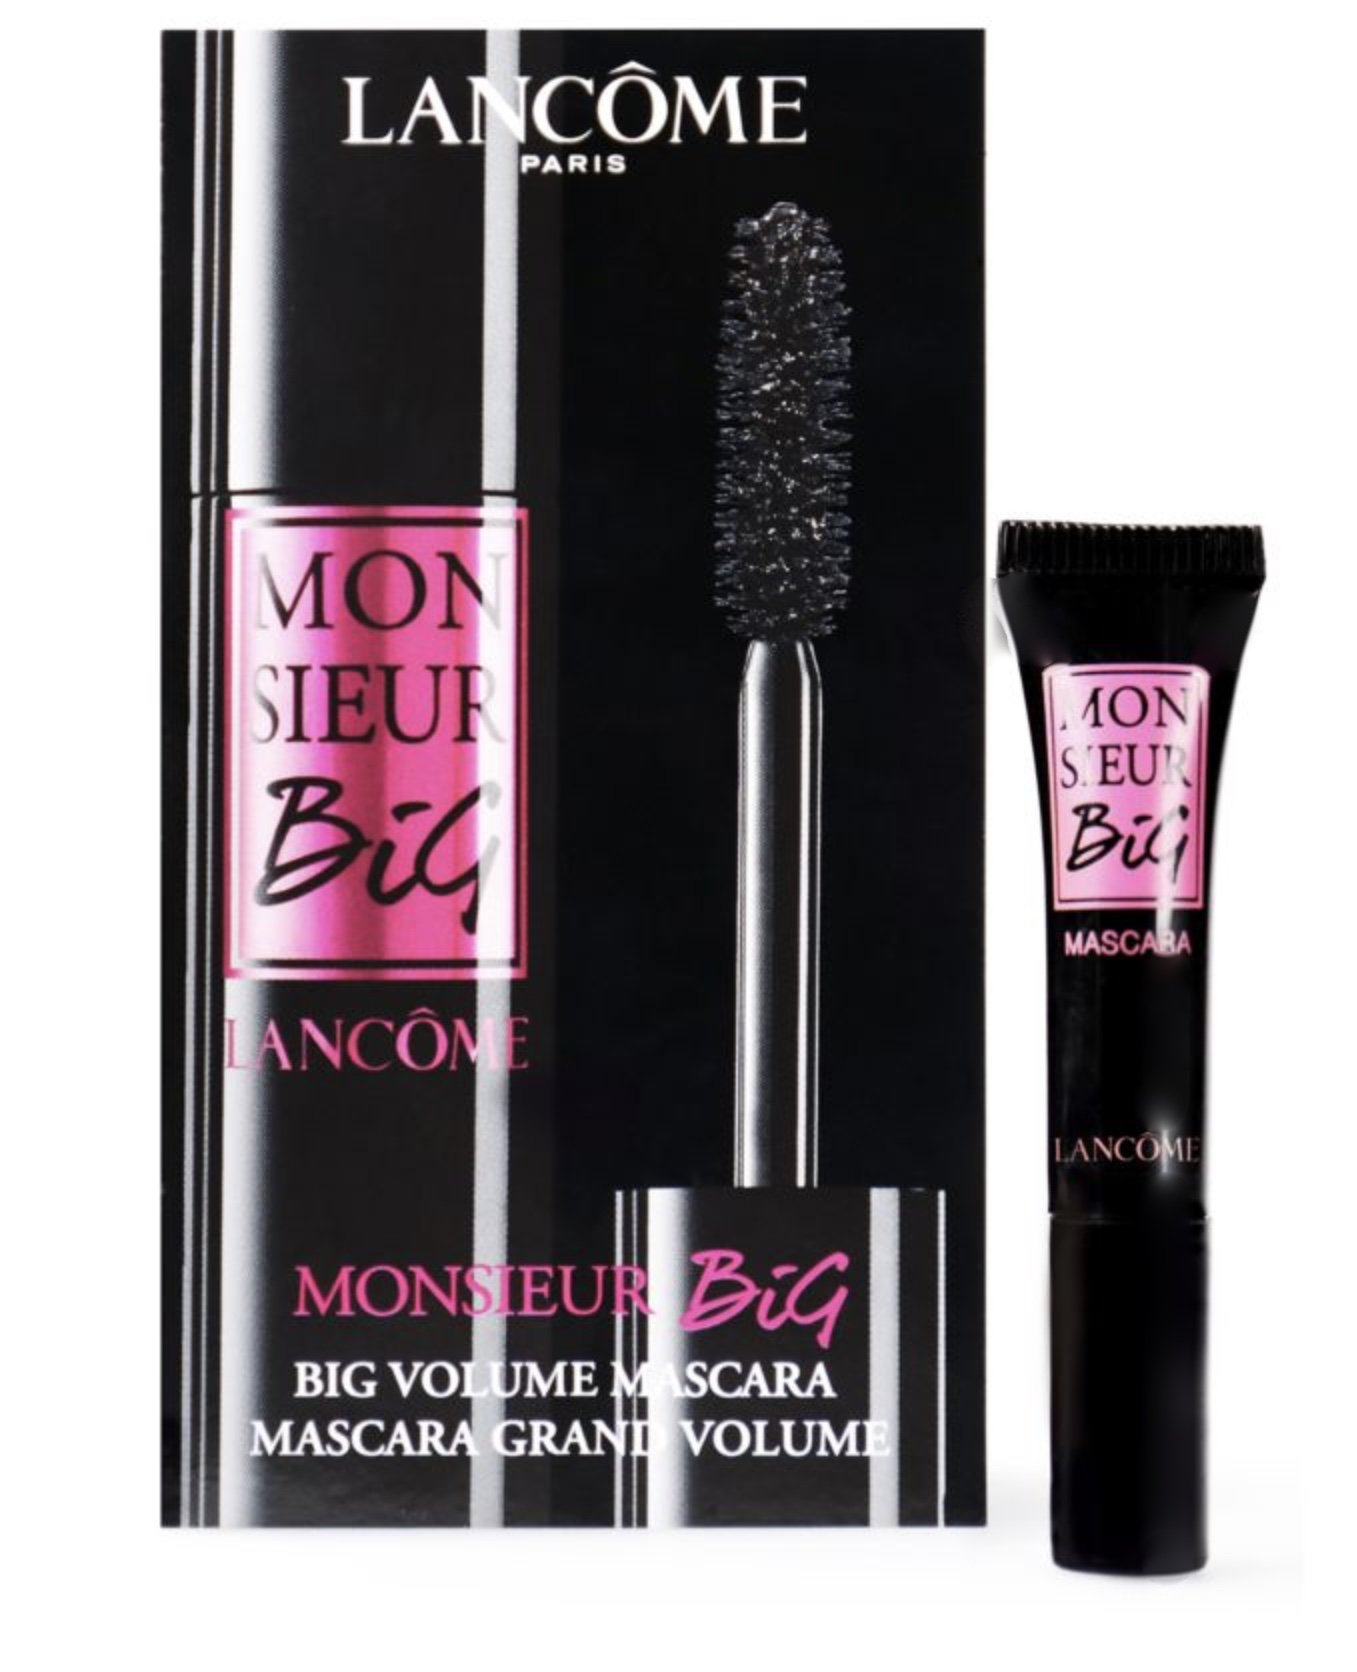 Monsieur Big Mascara by Lancôme #22